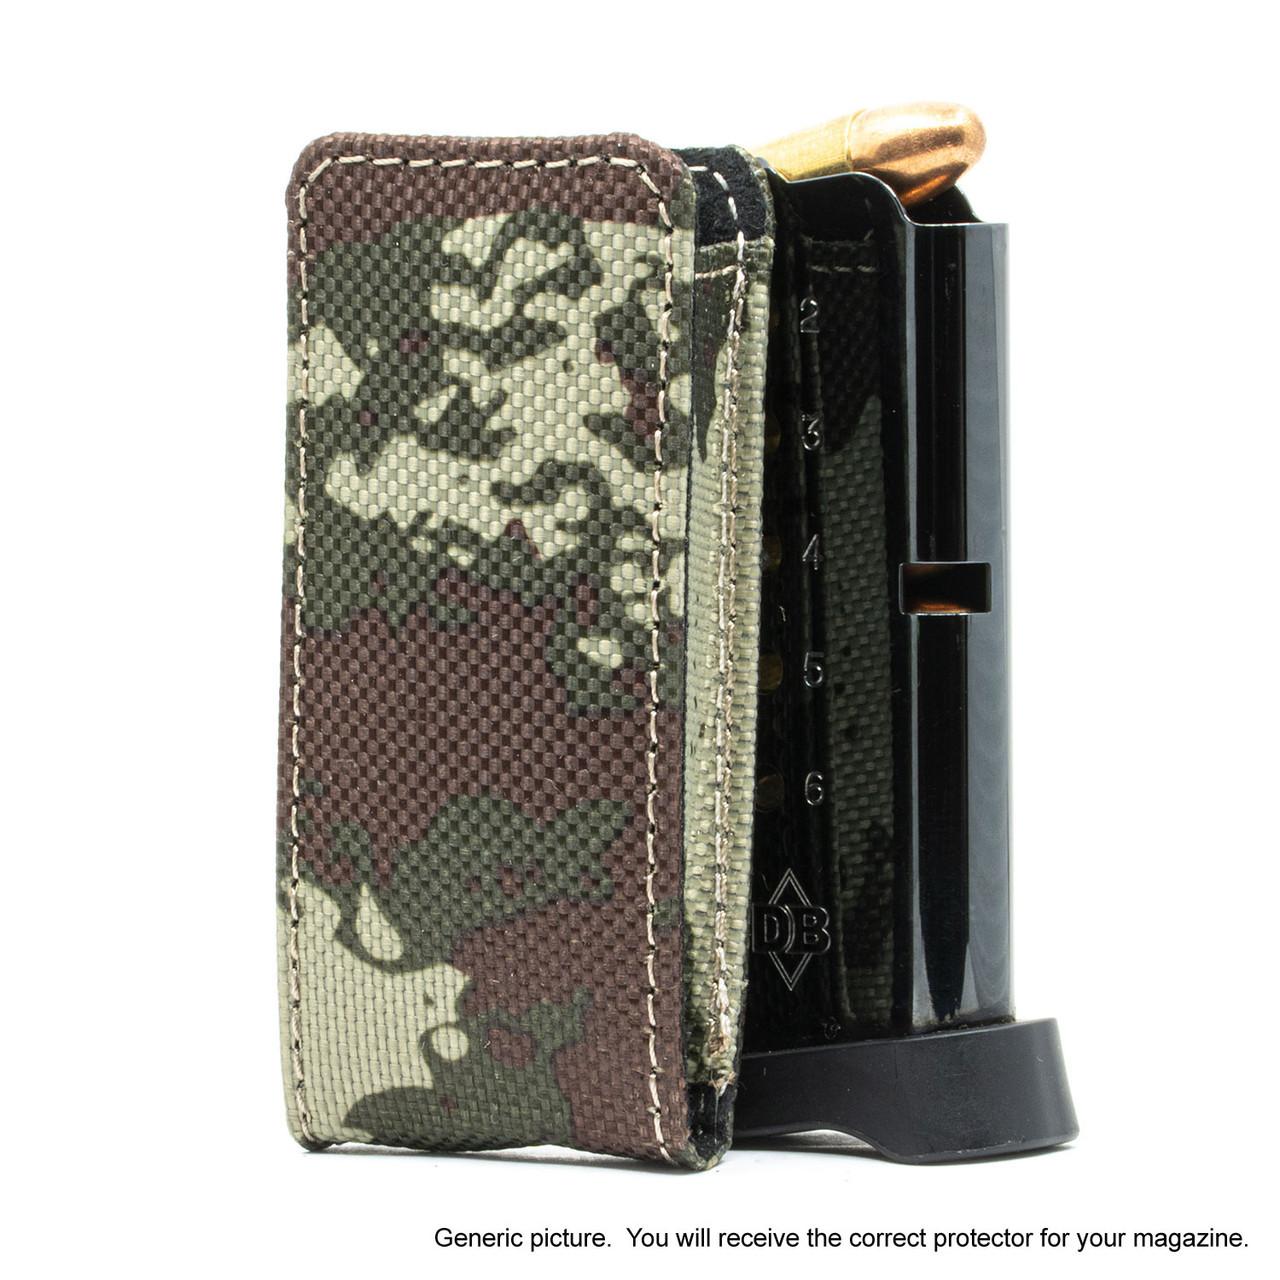 Colt Mark IV Series 80 (.380) Camouflage Nylon Magazine Pocket Protector